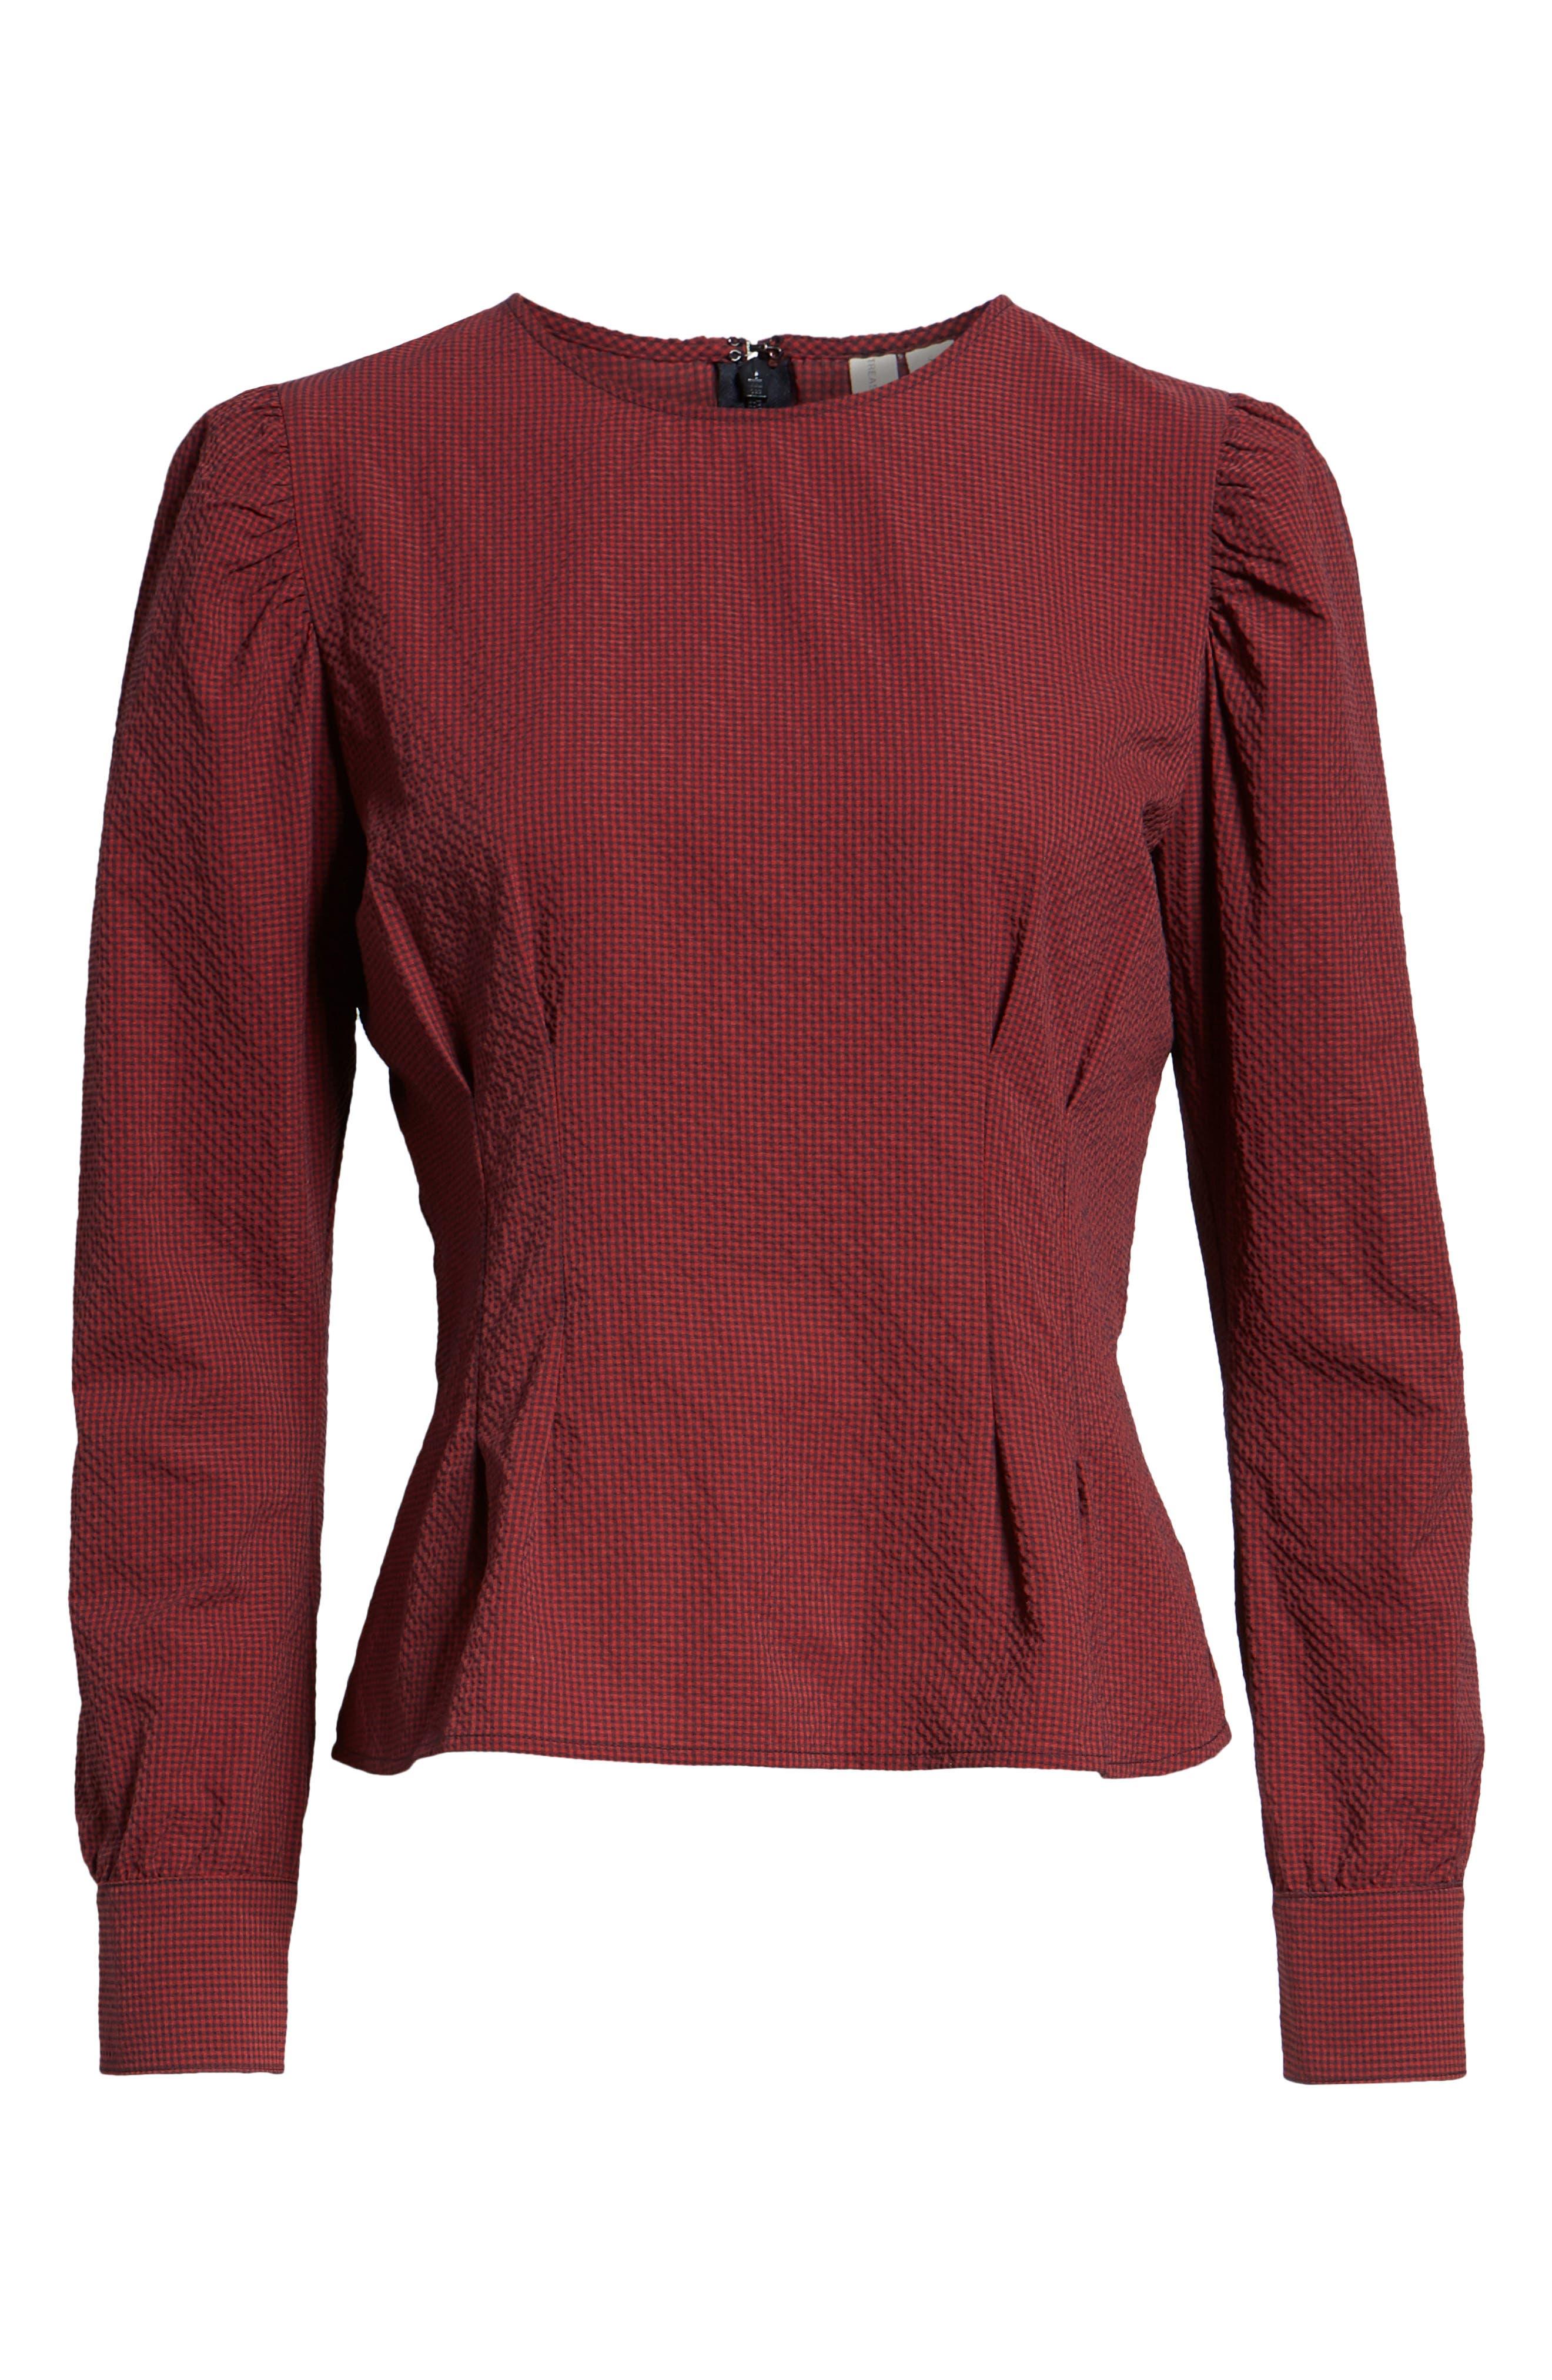 TREASURE & BOND,                             Mini Gingham Puff Sleeve Top,                             Alternate thumbnail 6, color,                             610